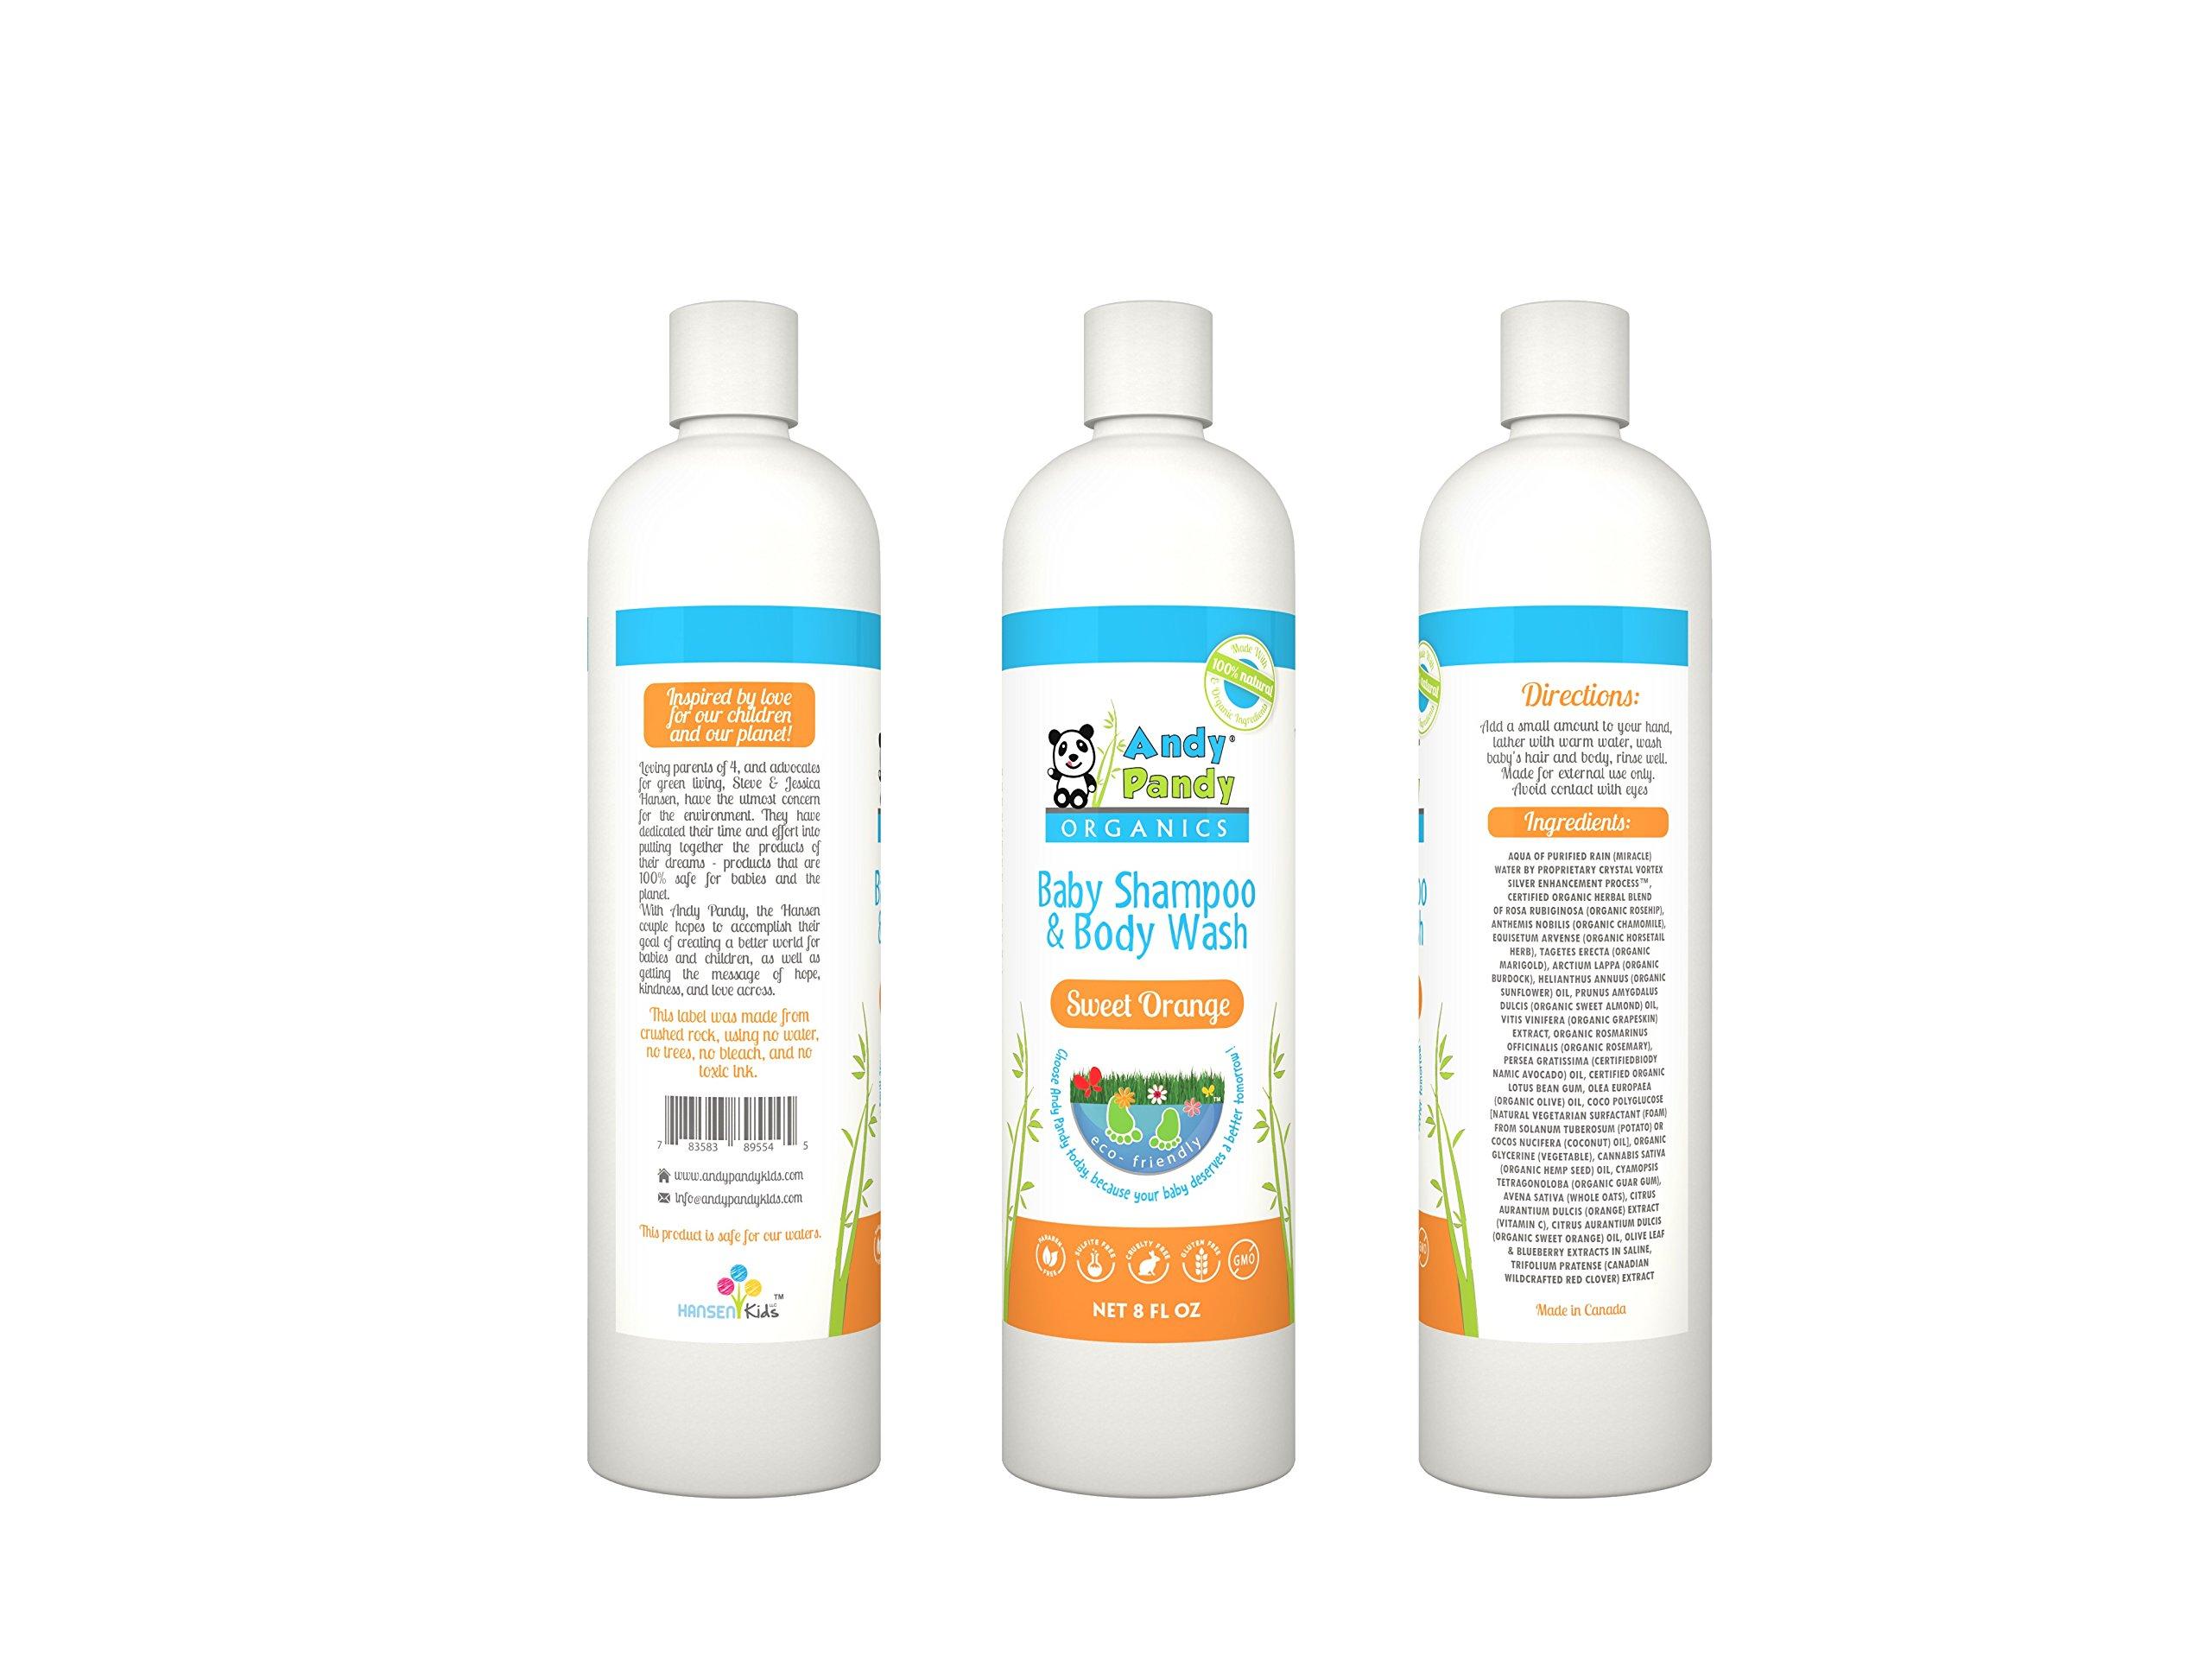 Andy Pandy Organics 100% Natural & Organic Baby Body Wash & Shampoo (8 fl oz, Sweet Orange)